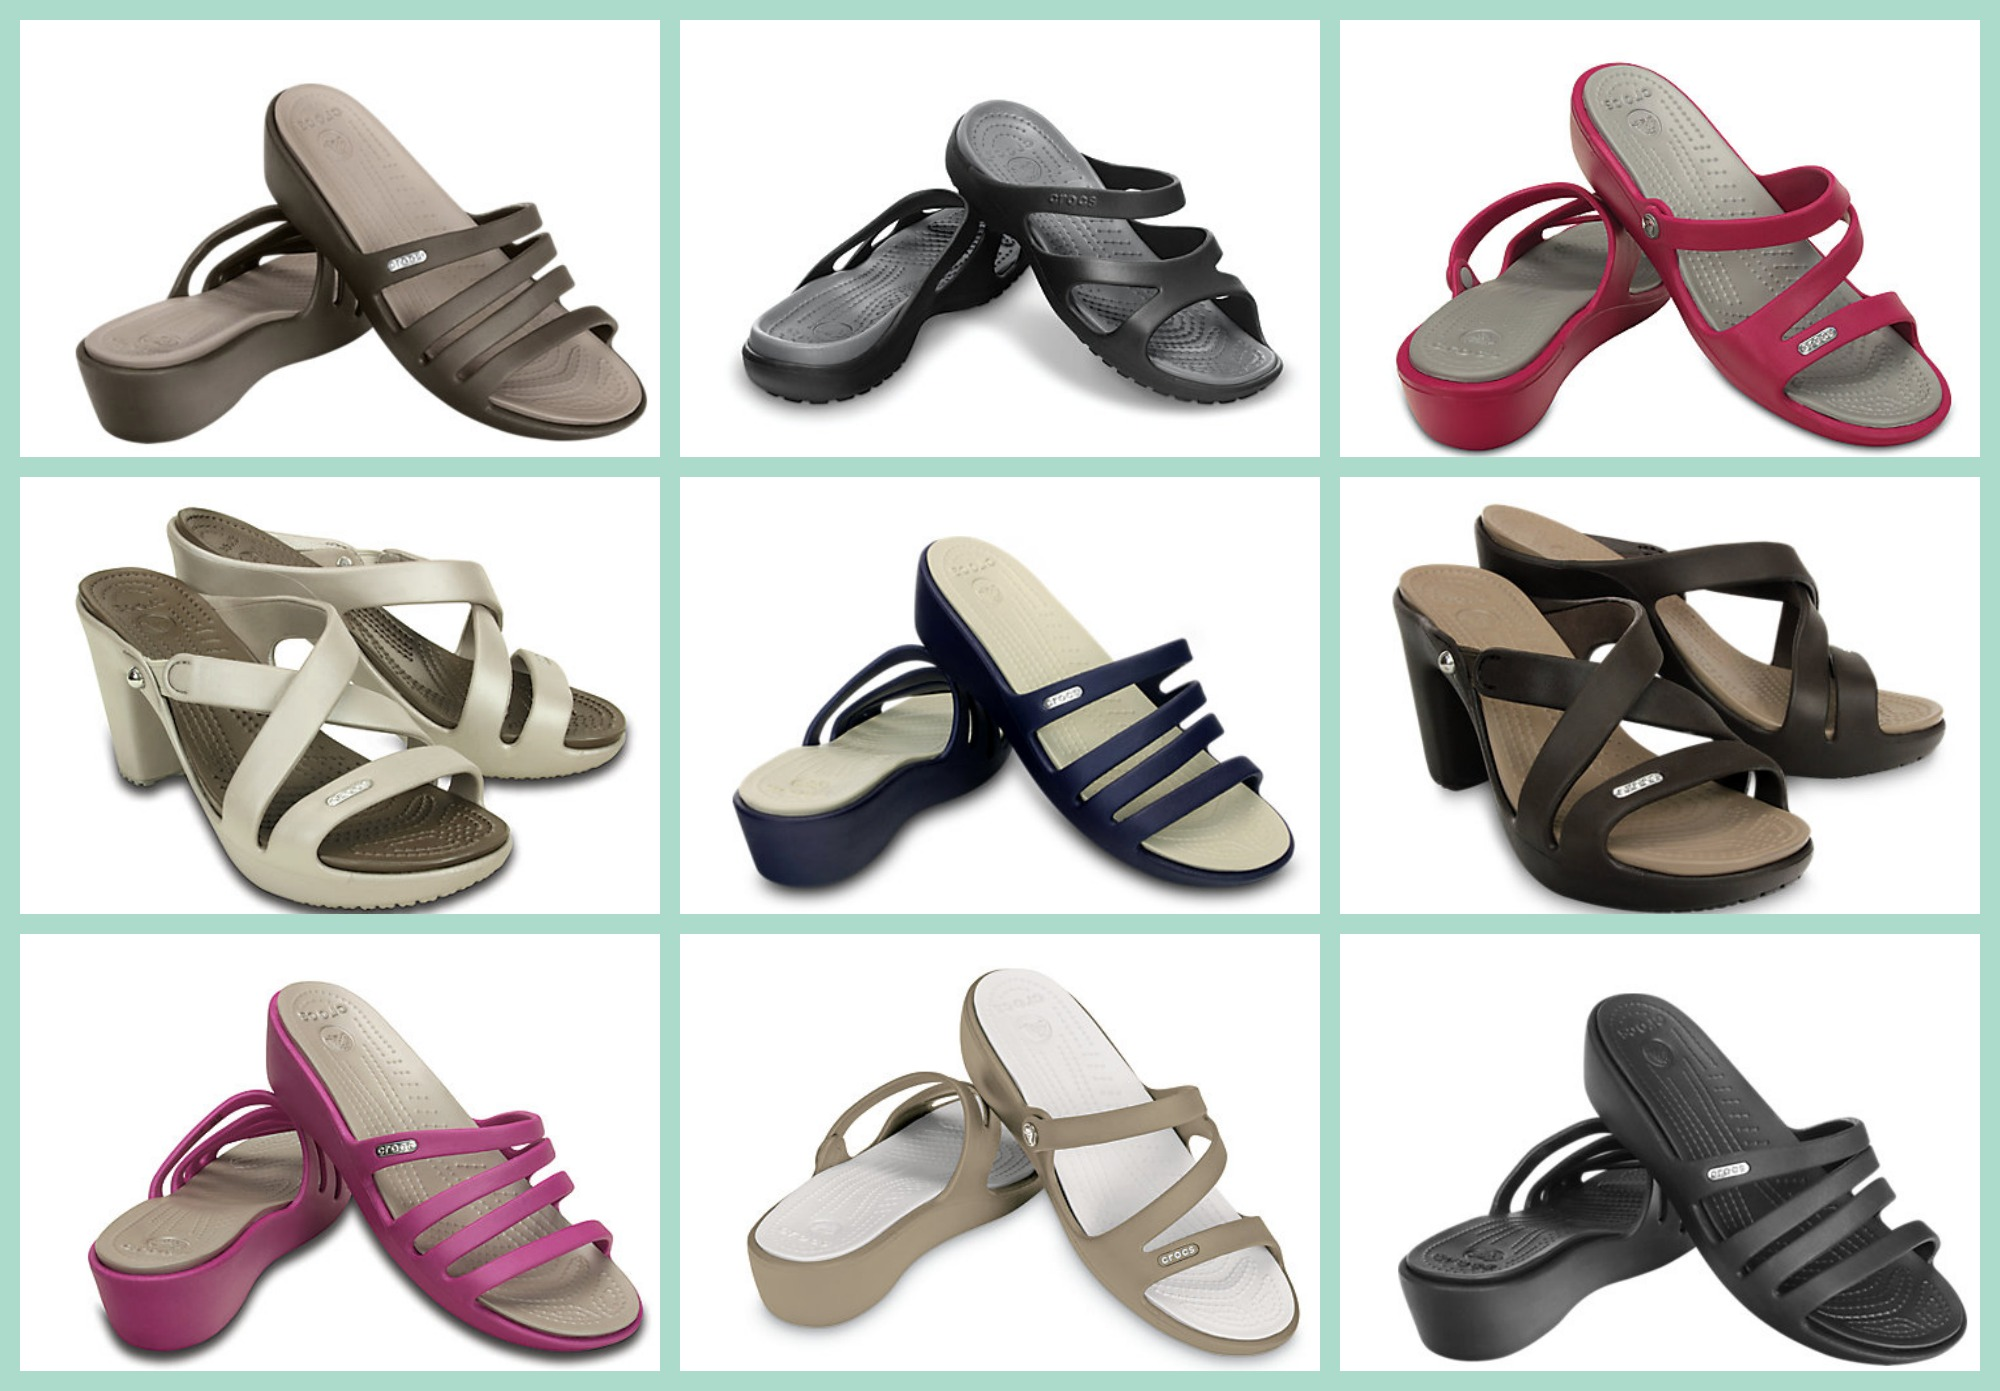 17ec592df39c2 Crocs  50% Off Women s Sandals (As low as  17.49!)